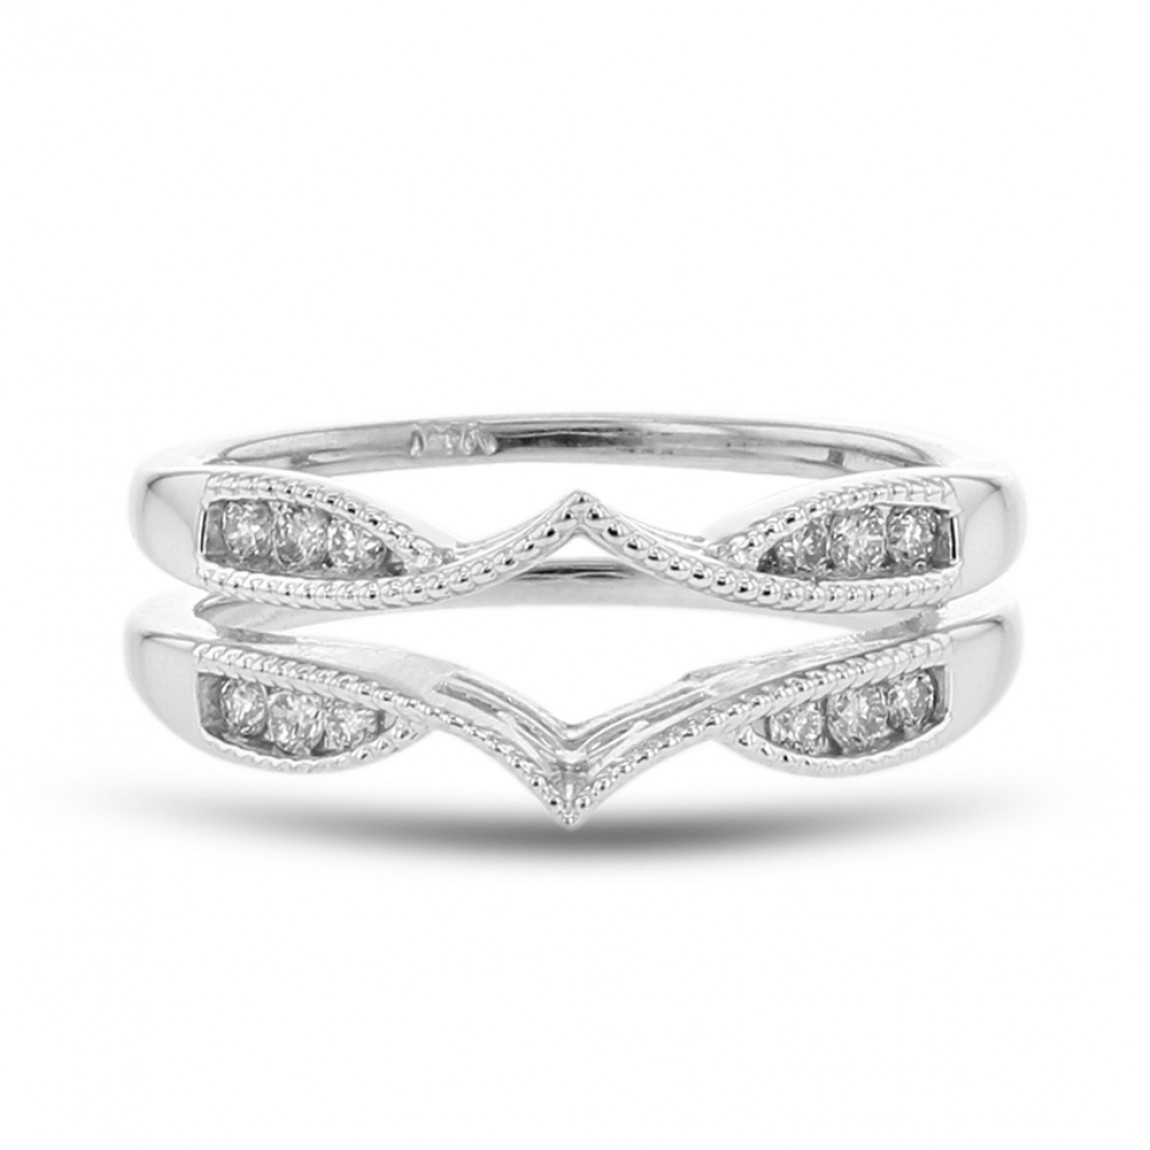 Diamond Cradle Wedding Band, Milgrain, 14K White Gold,  (View 7 of 25)